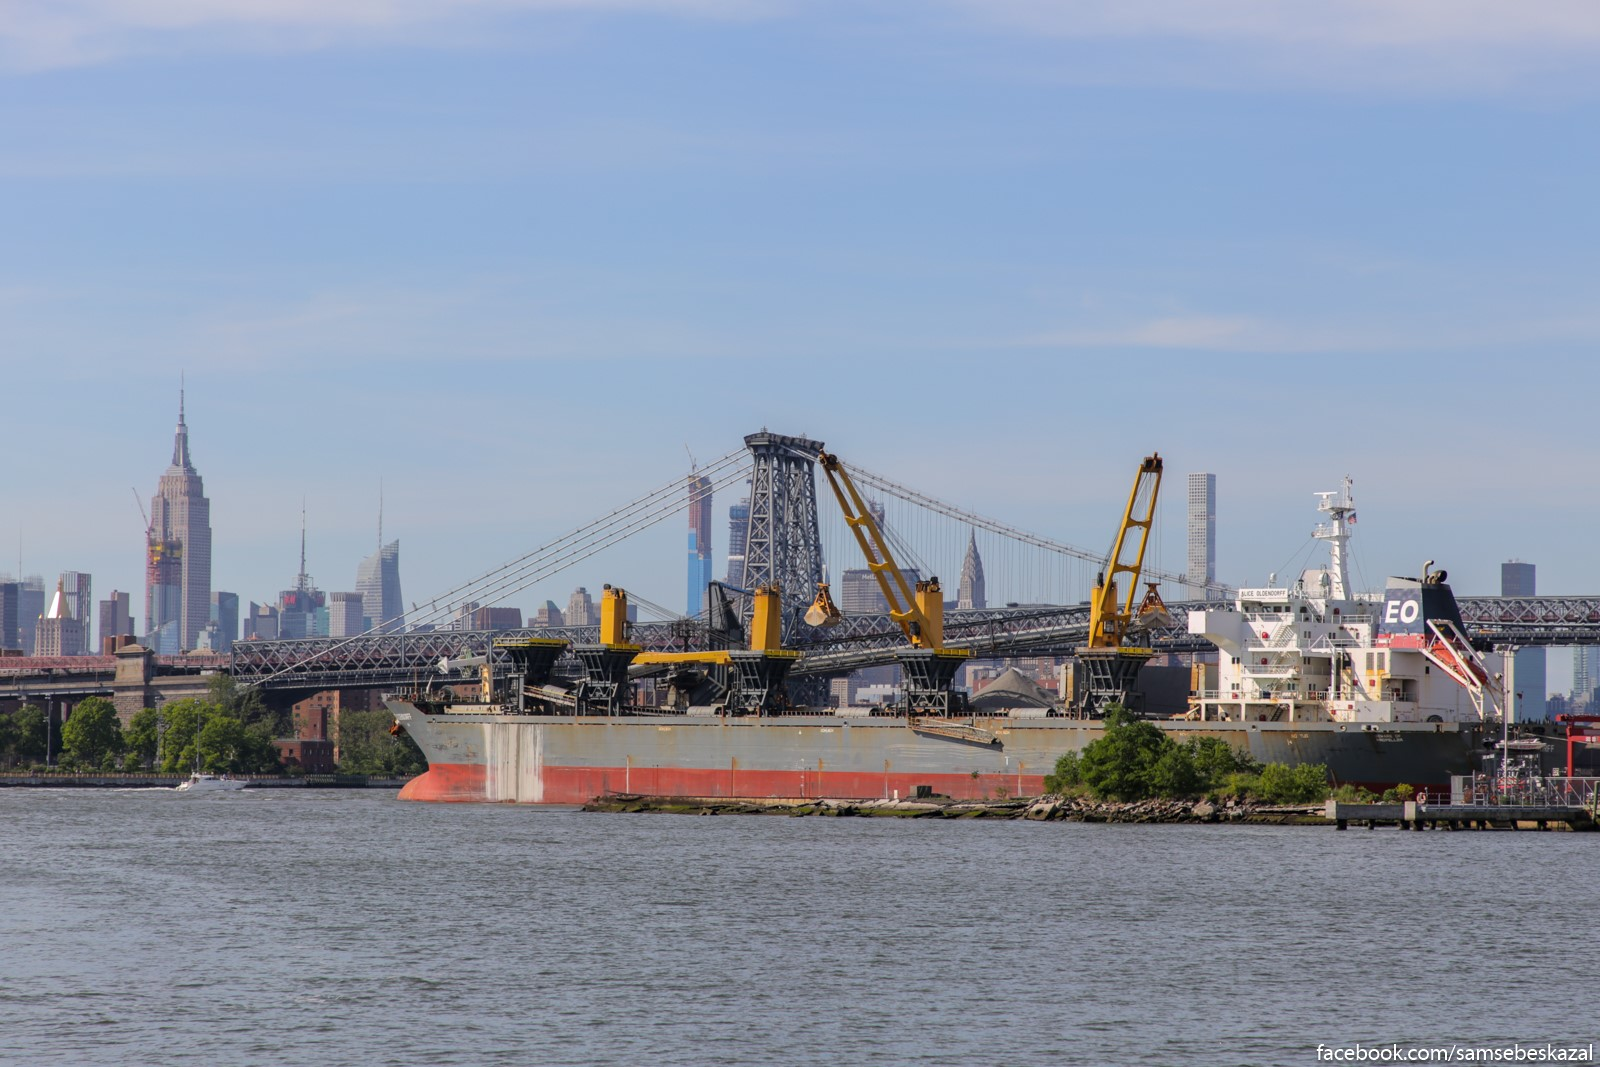 Okeanskij suhogruz na fone Uilʹamsburgskogo mosta i nʹu-jorkskih neboskrebov. Bruklin Nevi-Ard.